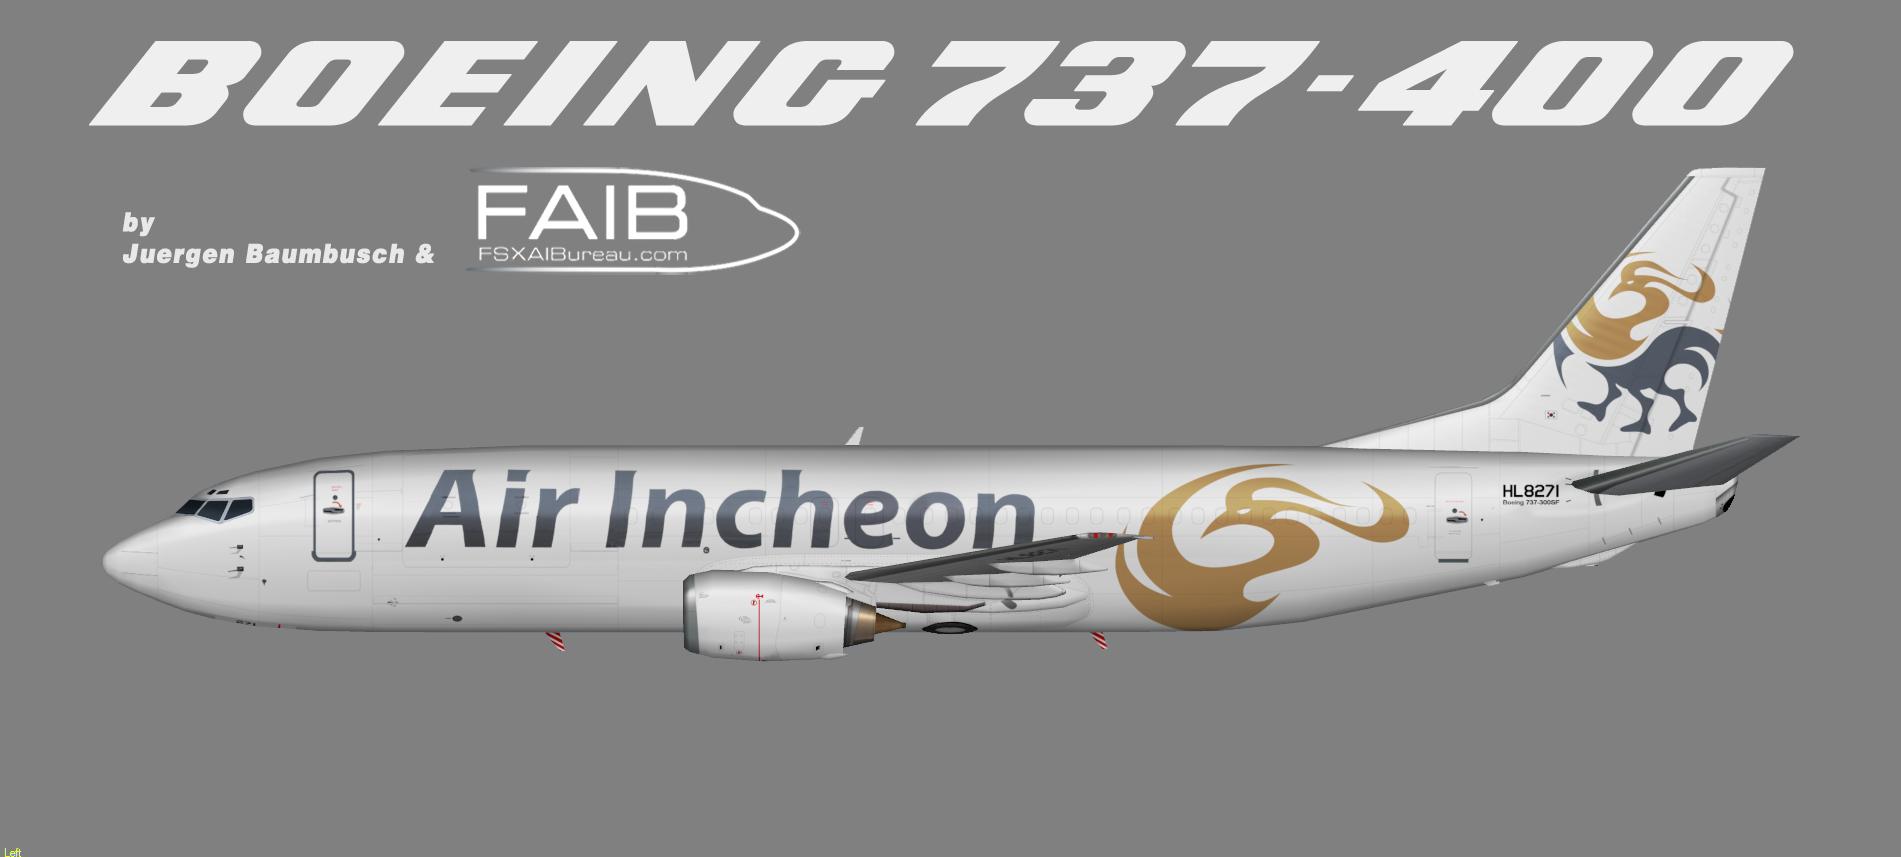 Air Incheon Boeing 737-400F